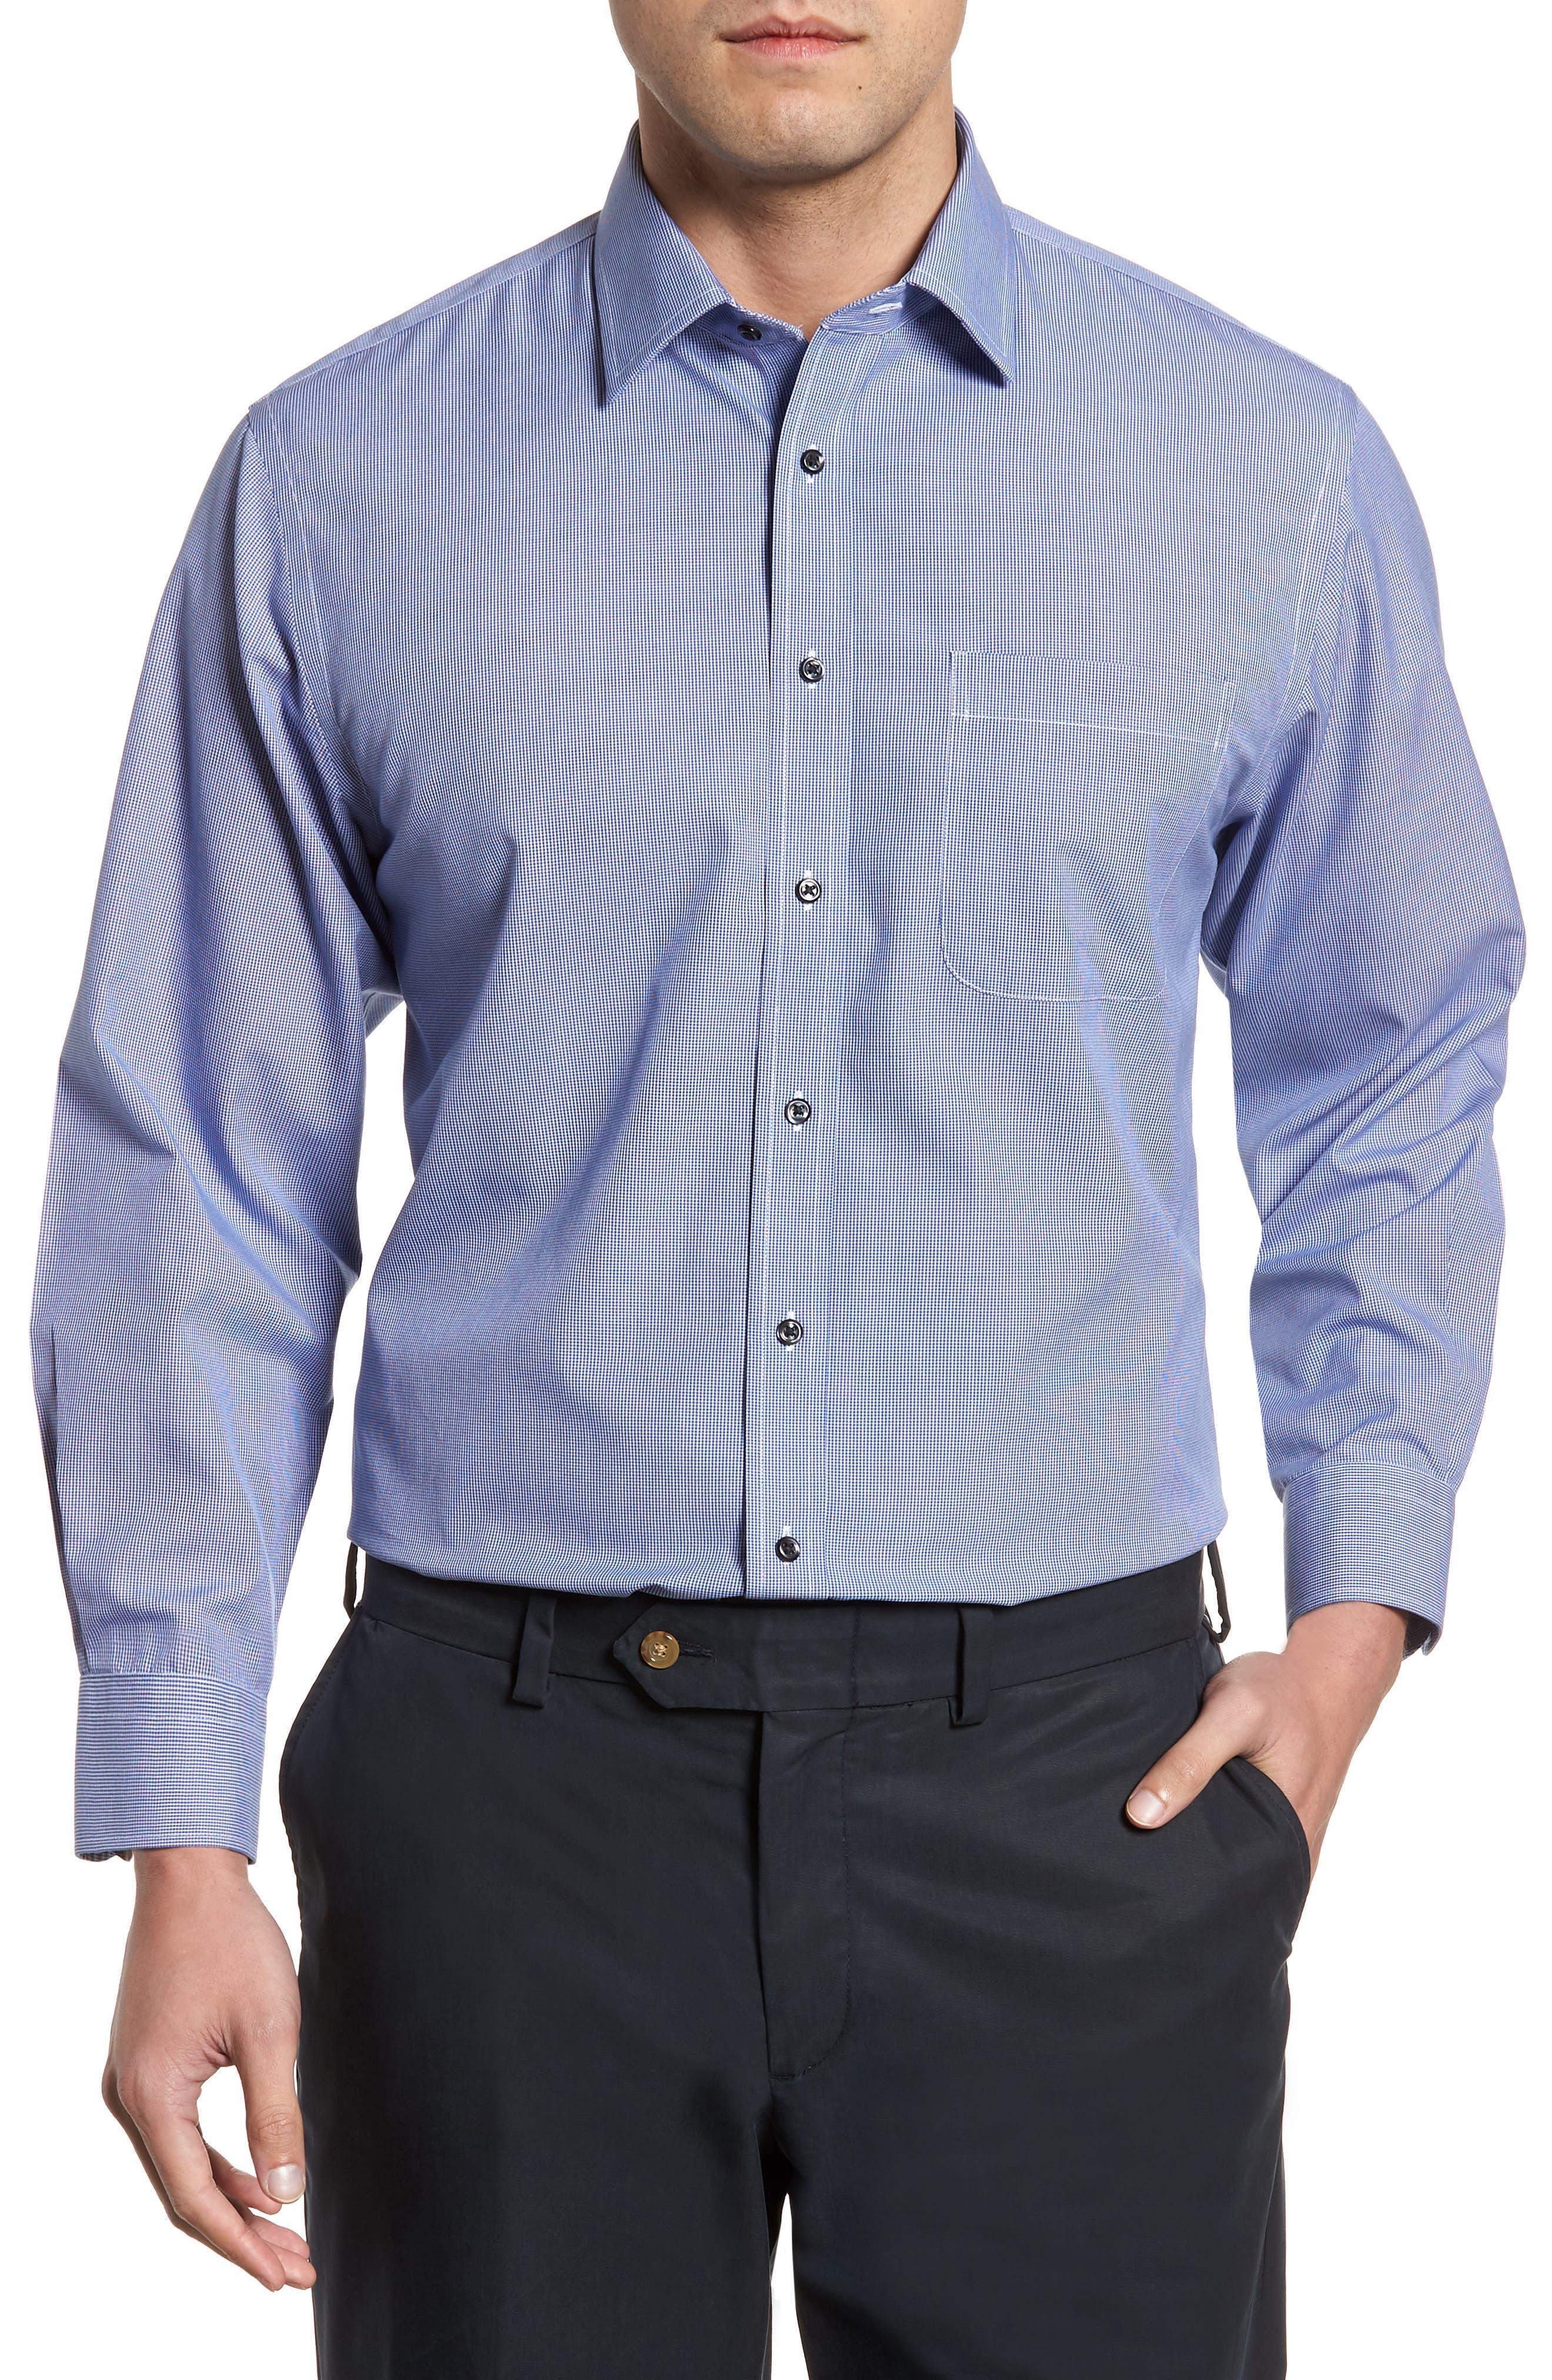 Smartcare<sup>™</sup> Traditional Fit Micro Check Dress Shirt,                             Main thumbnail 1, color,                             420